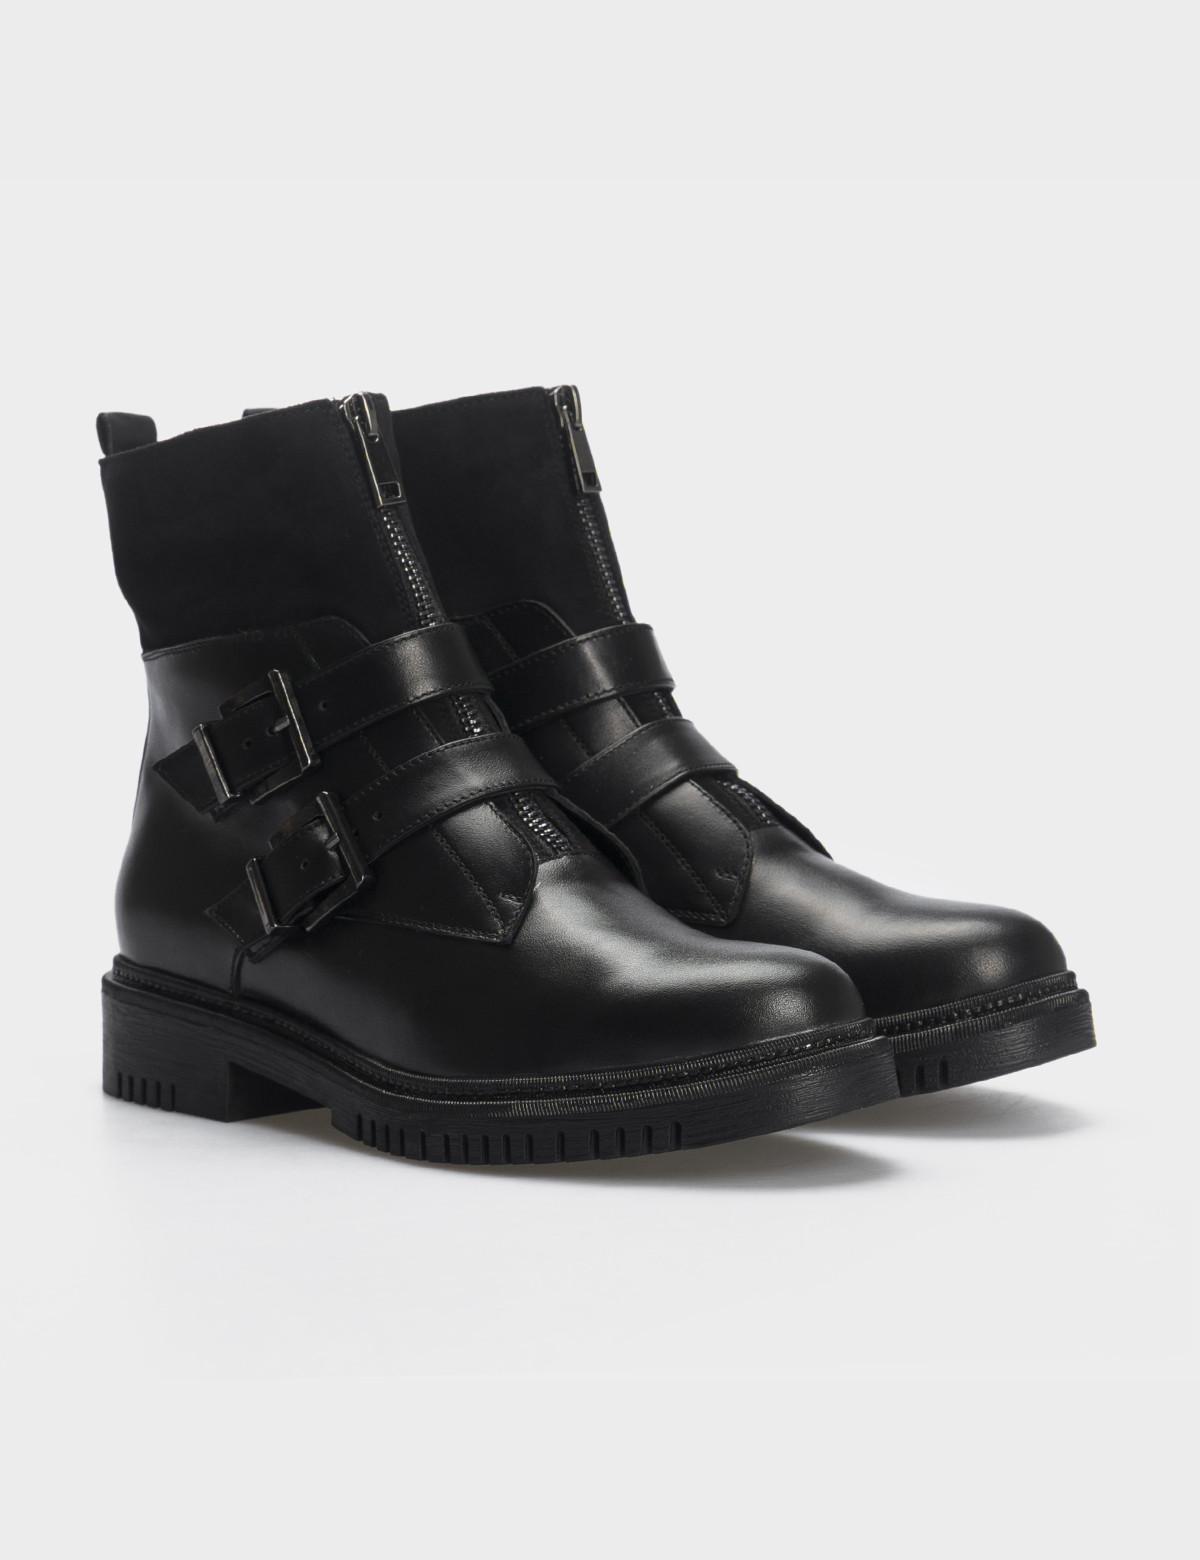 Ботинки, натуральная кожа/замша. Байка1